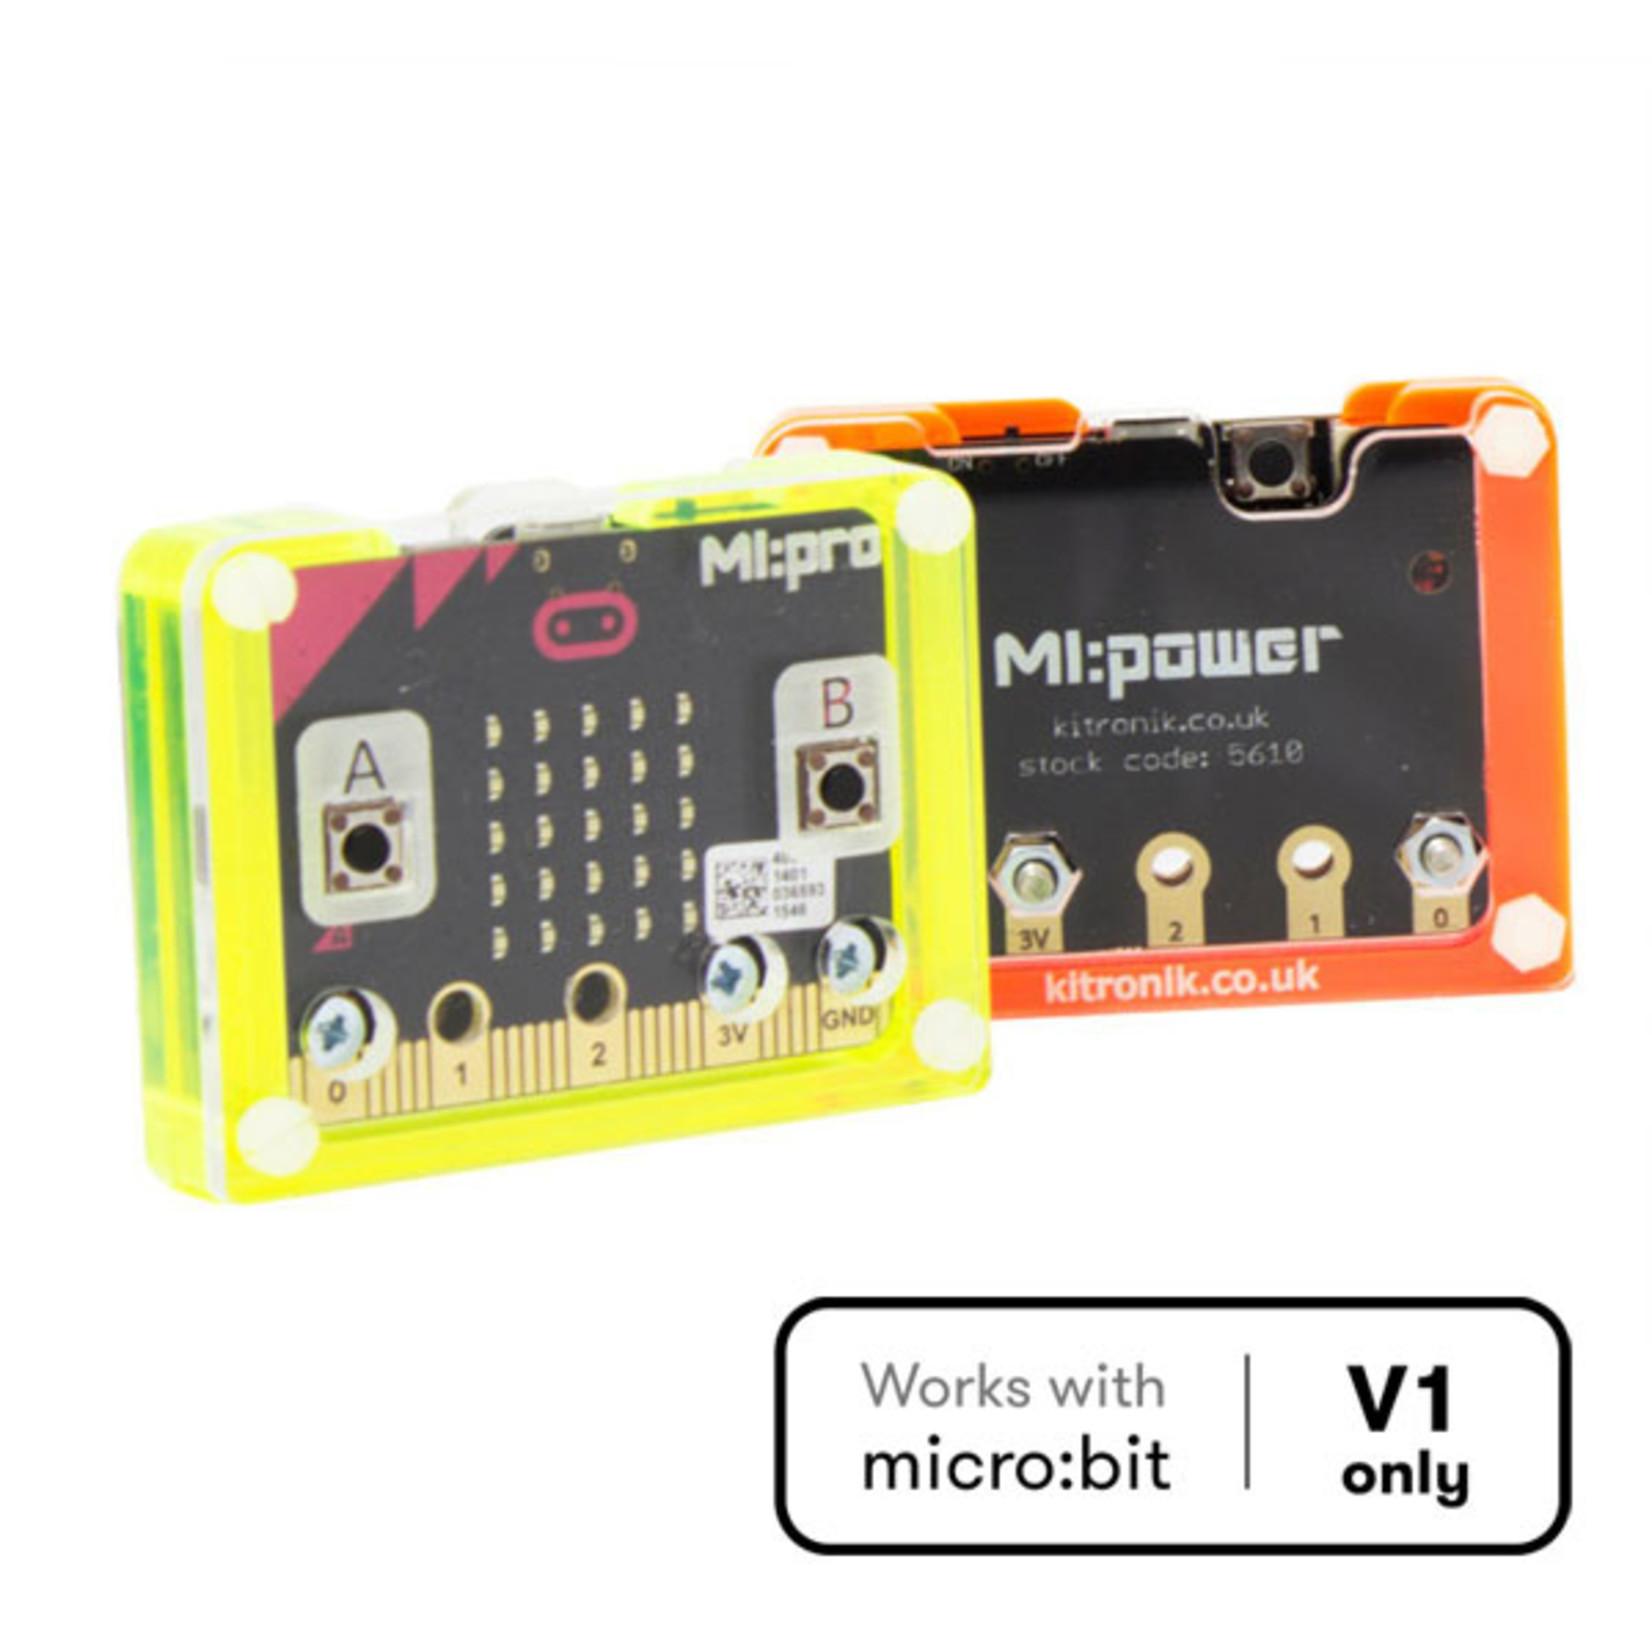 Kitronik MI:power Case for the BBC micro:bit - Blue